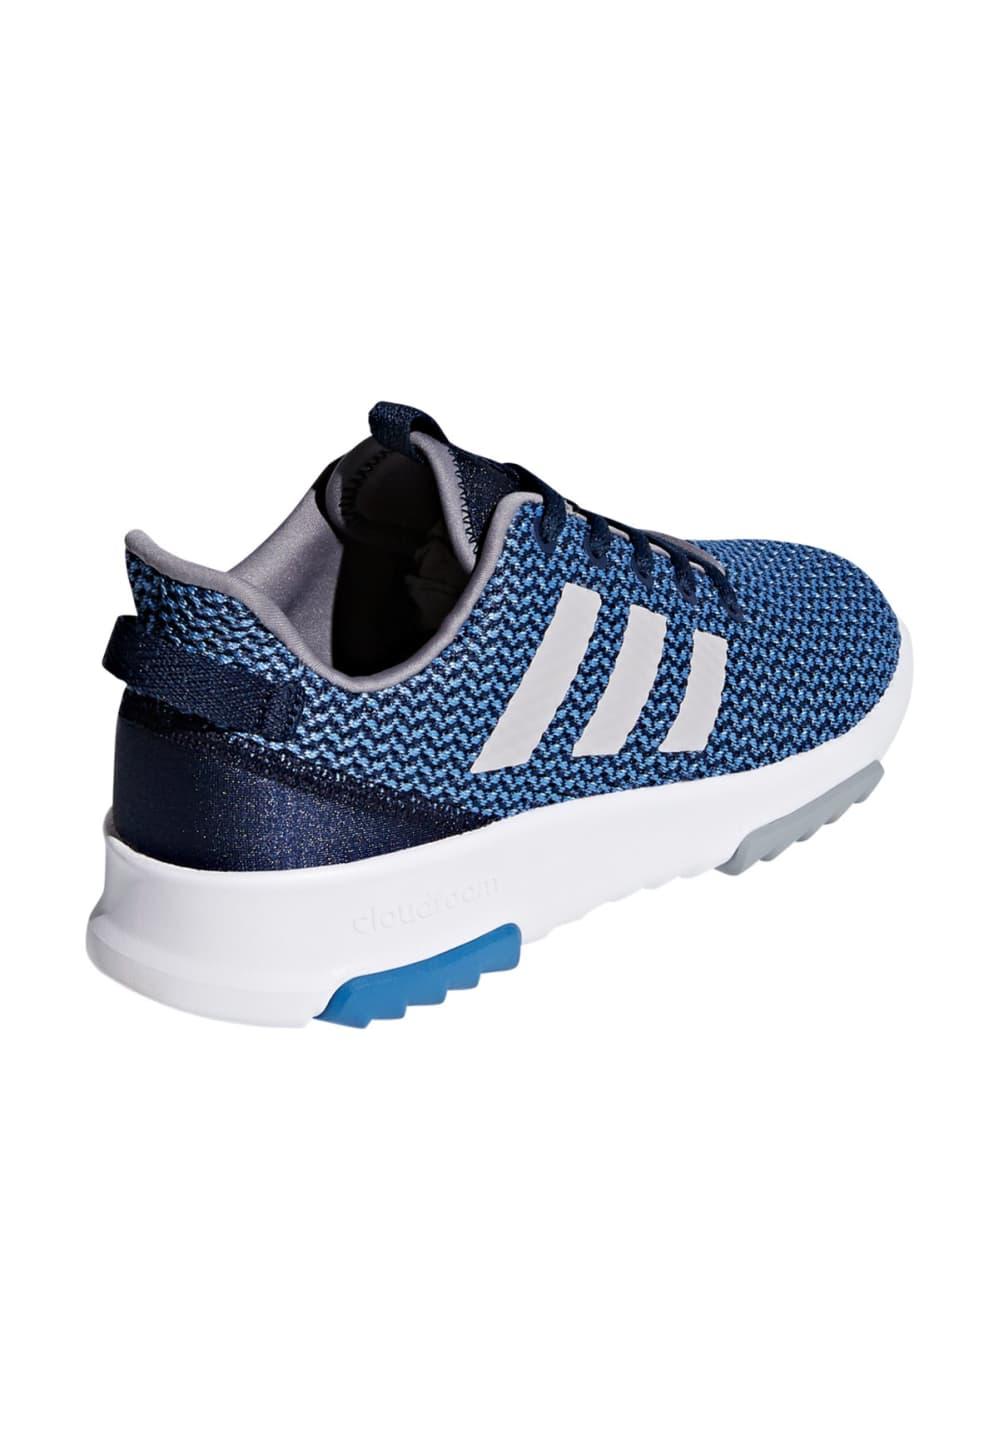 adidas Cloudfoam Racer TR Kids - Laufschuhe - Blau